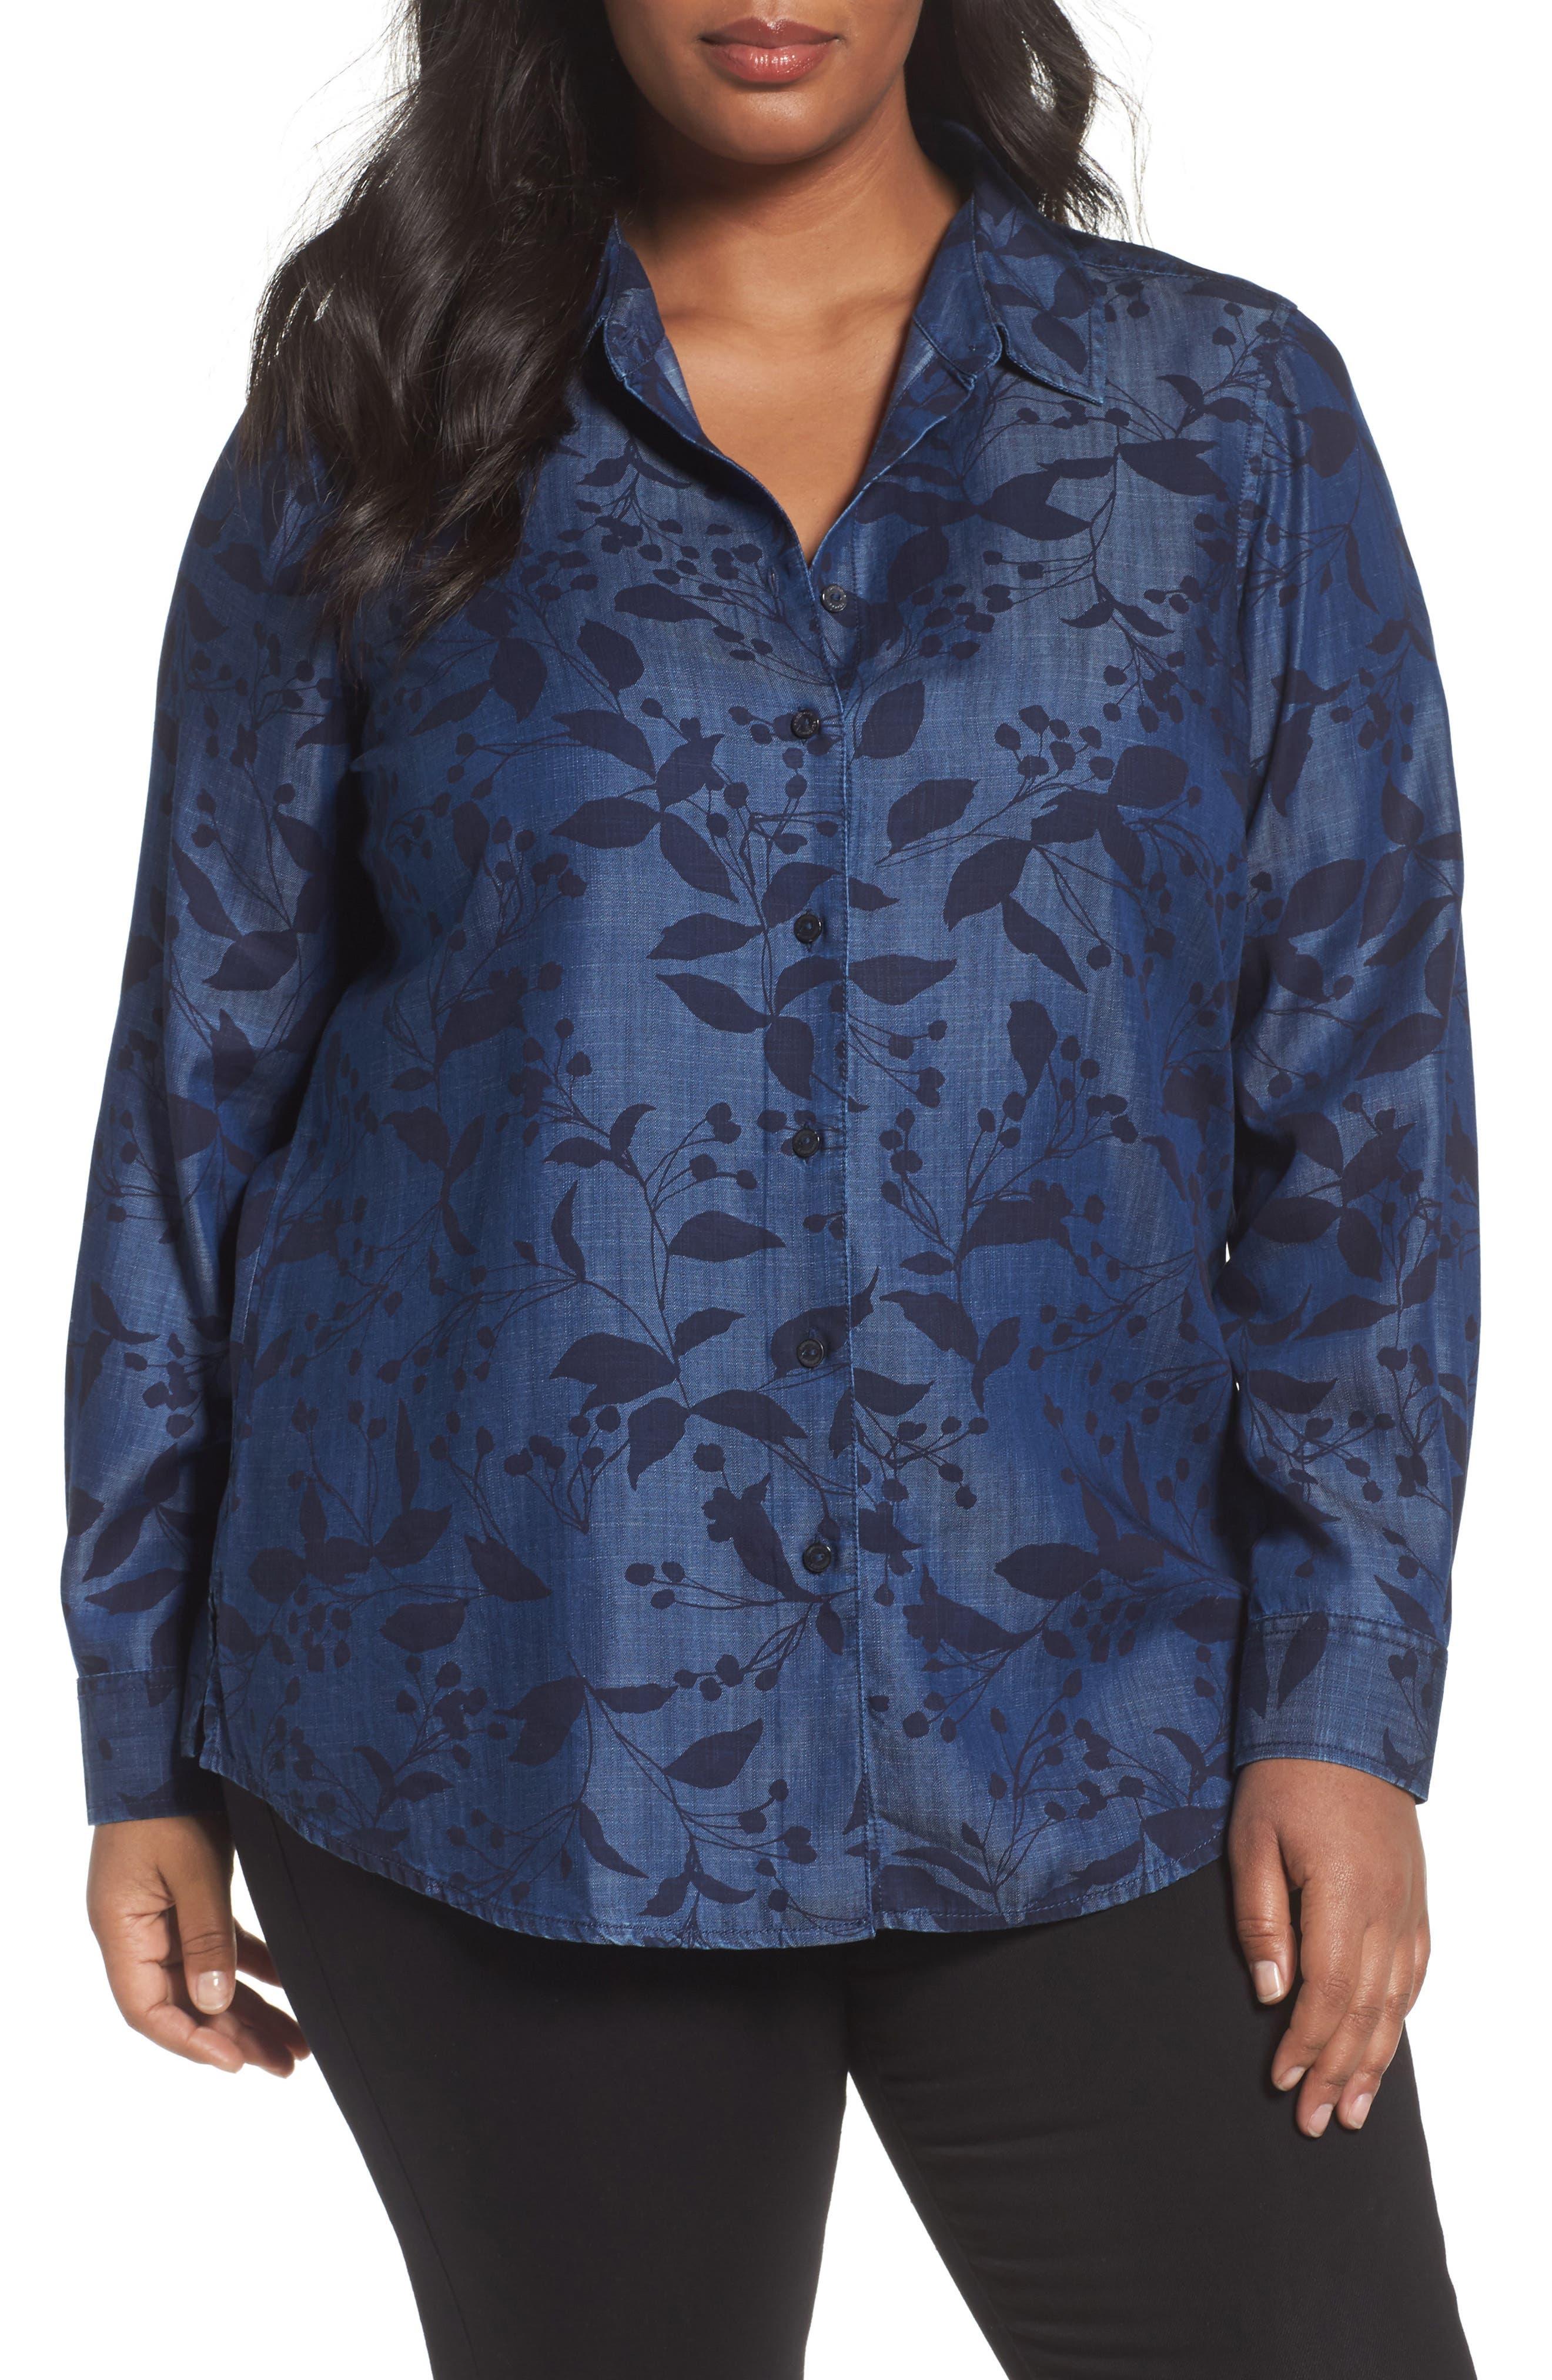 Foxcroft Addison Floral Print Tencel® Shirt (Plus Size)